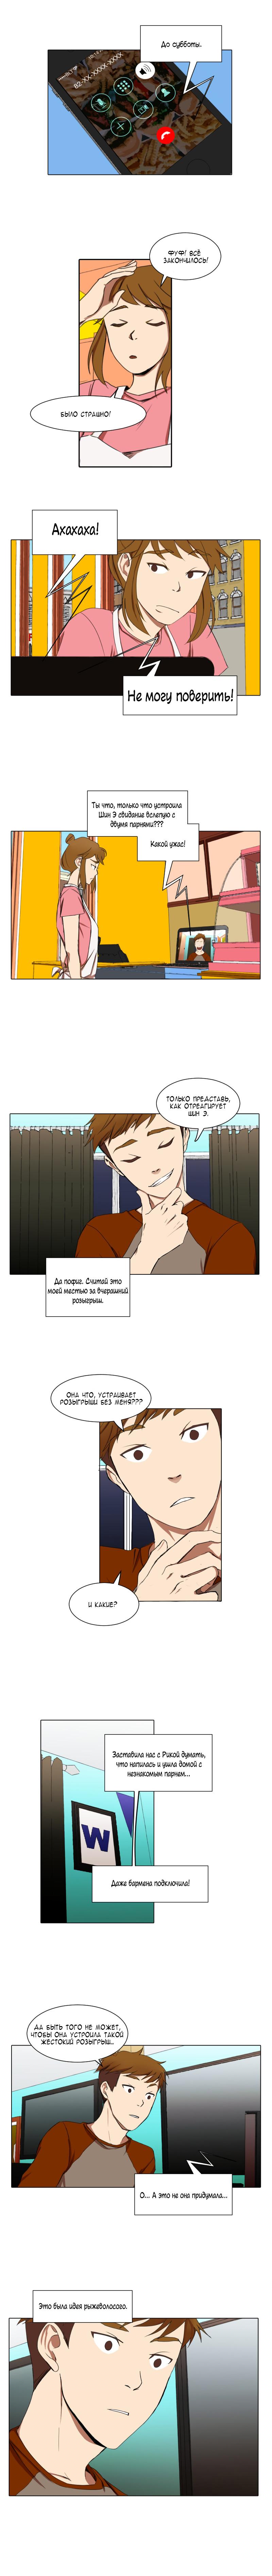 https://r1.ninemanga.com/comics/pic2/27/32027/337031/1510337425501.jpg Page 3